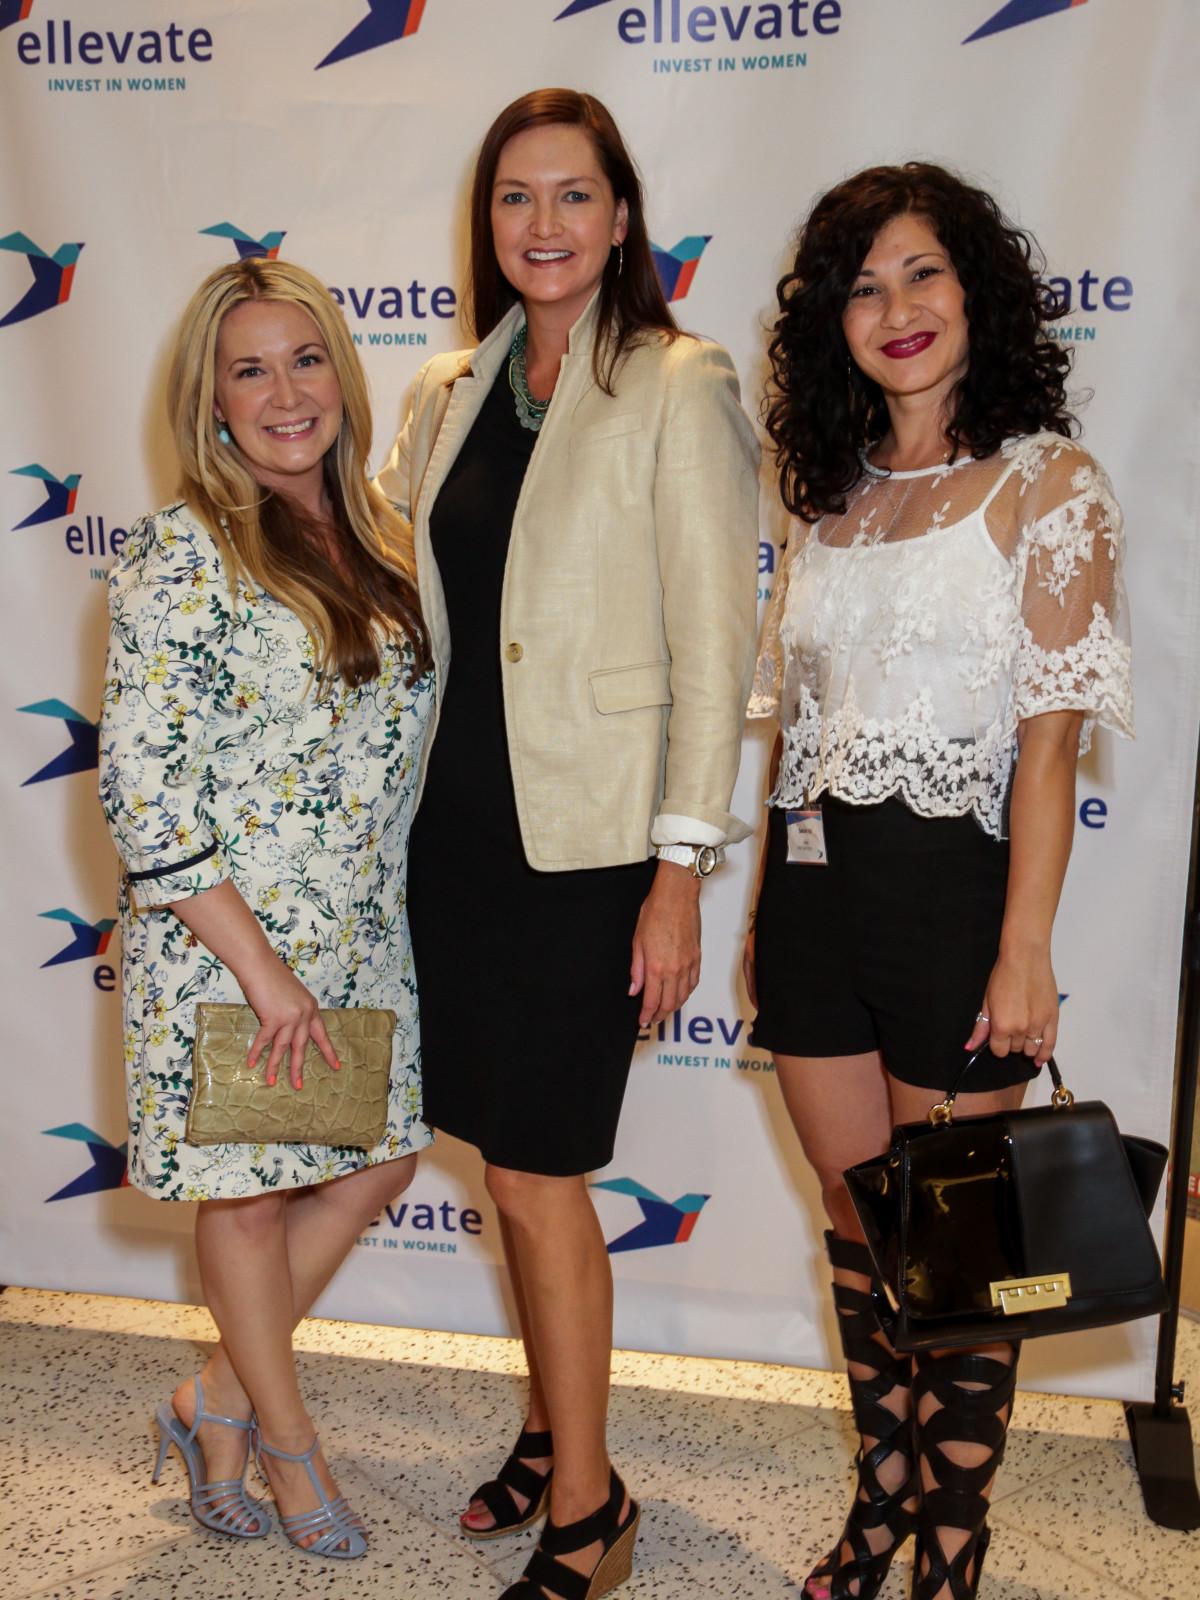 Houston, Ellevate event at Tootsies, August 2015, Misti Pace Krahl, Lisa Pounds, Sahar Paz